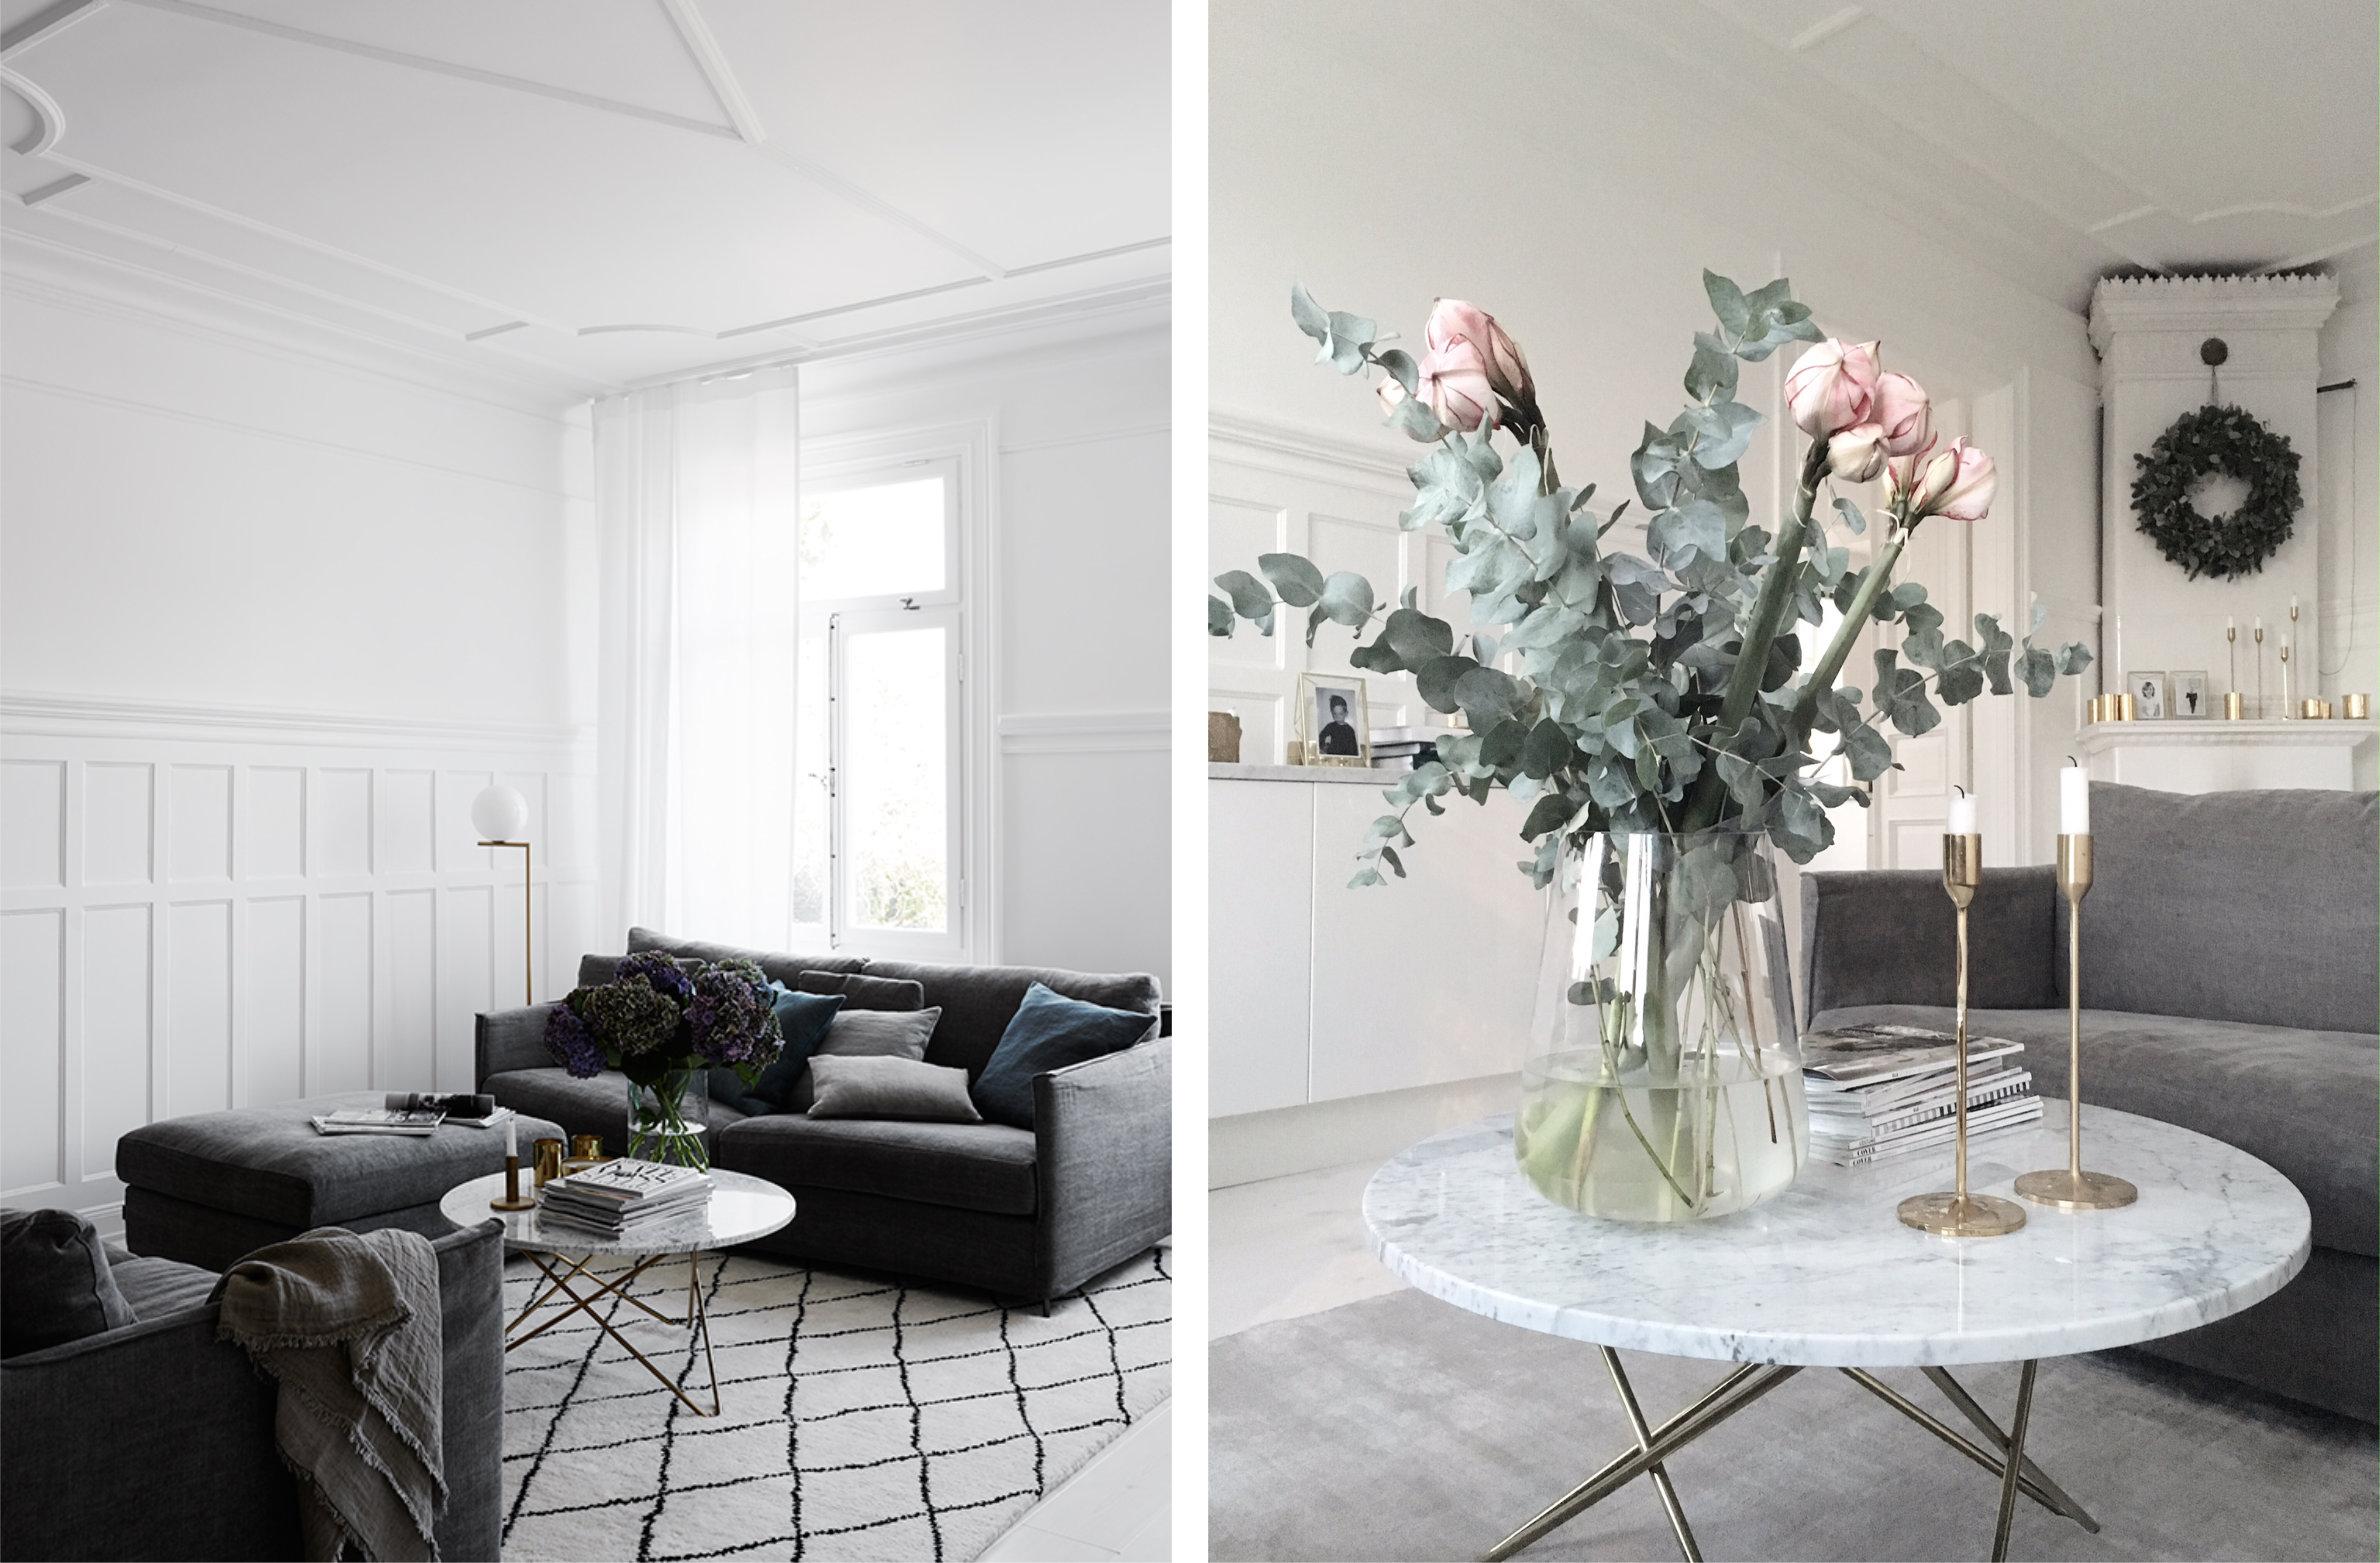 interiorlines_homestyling_sved_apartman3.jpg